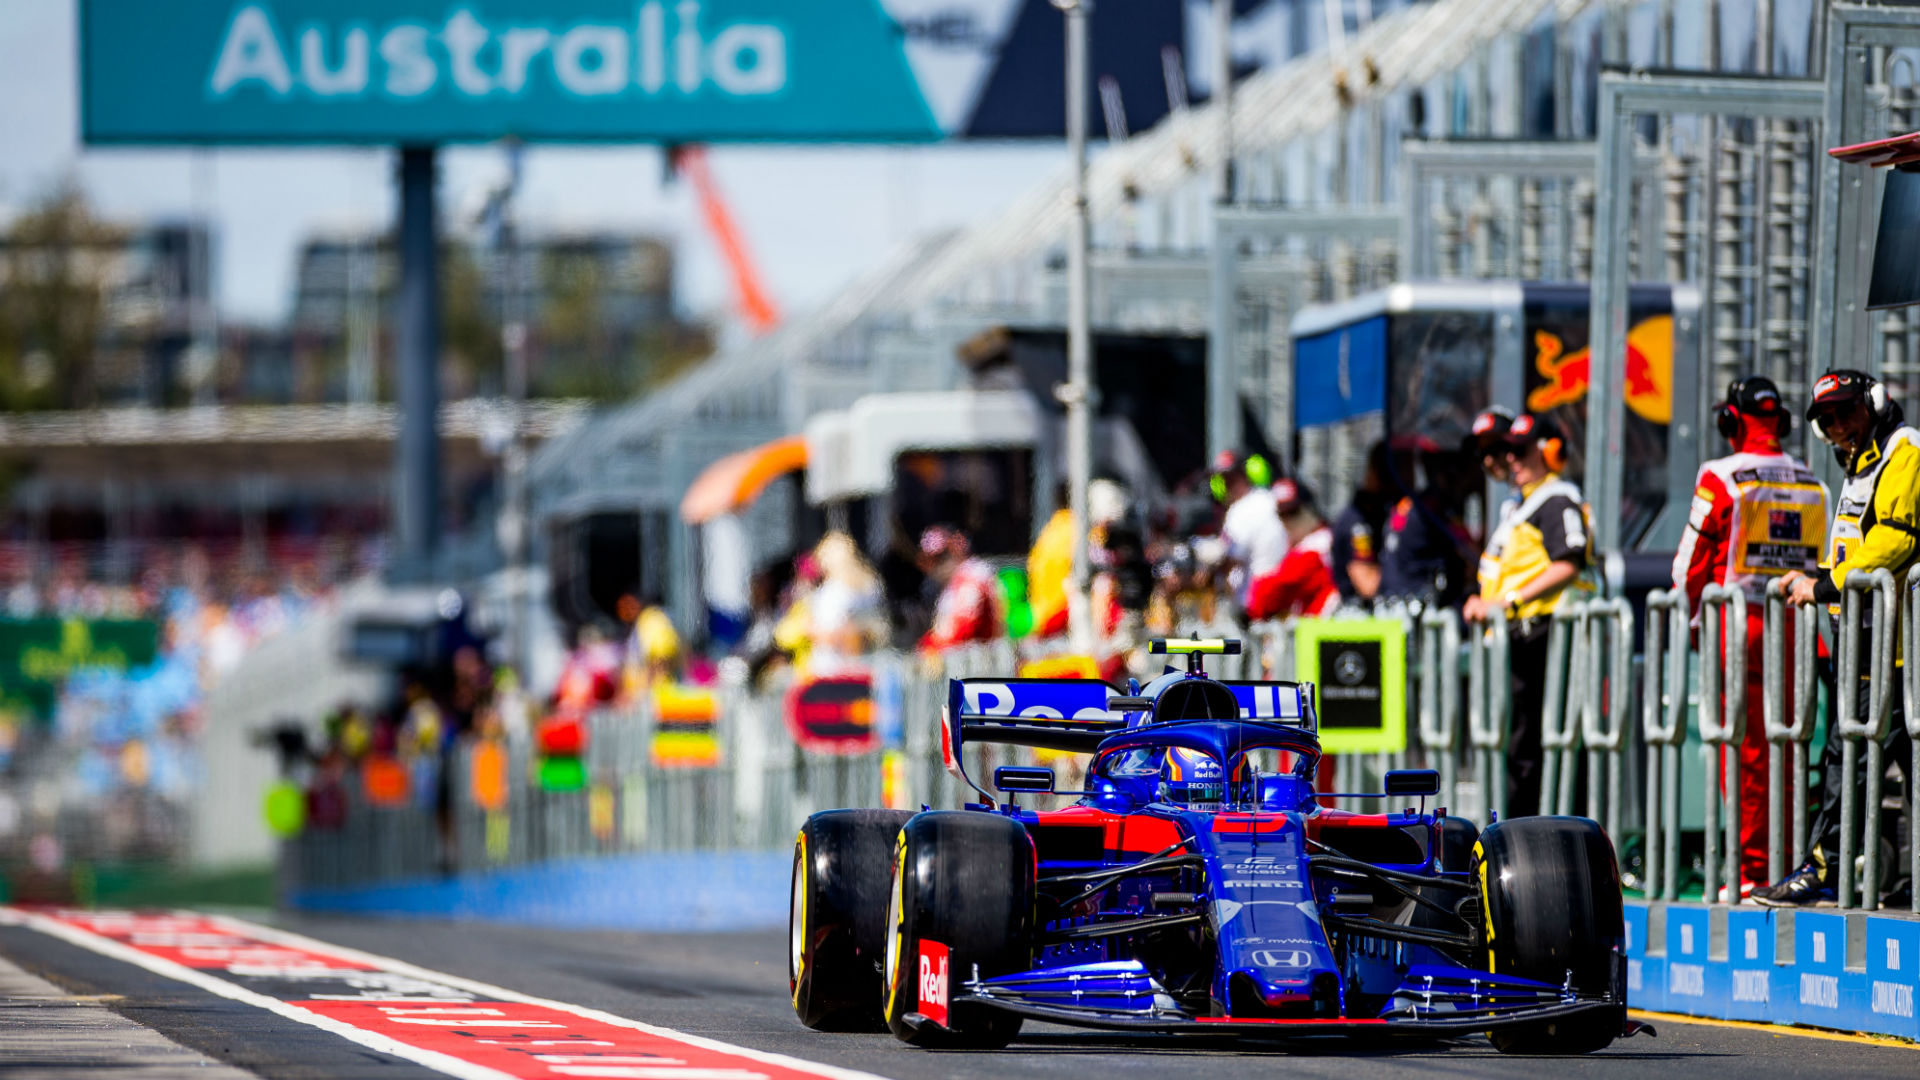 f1 australian grand prix start time tv channel live stream for formula 1 season opener. Black Bedroom Furniture Sets. Home Design Ideas